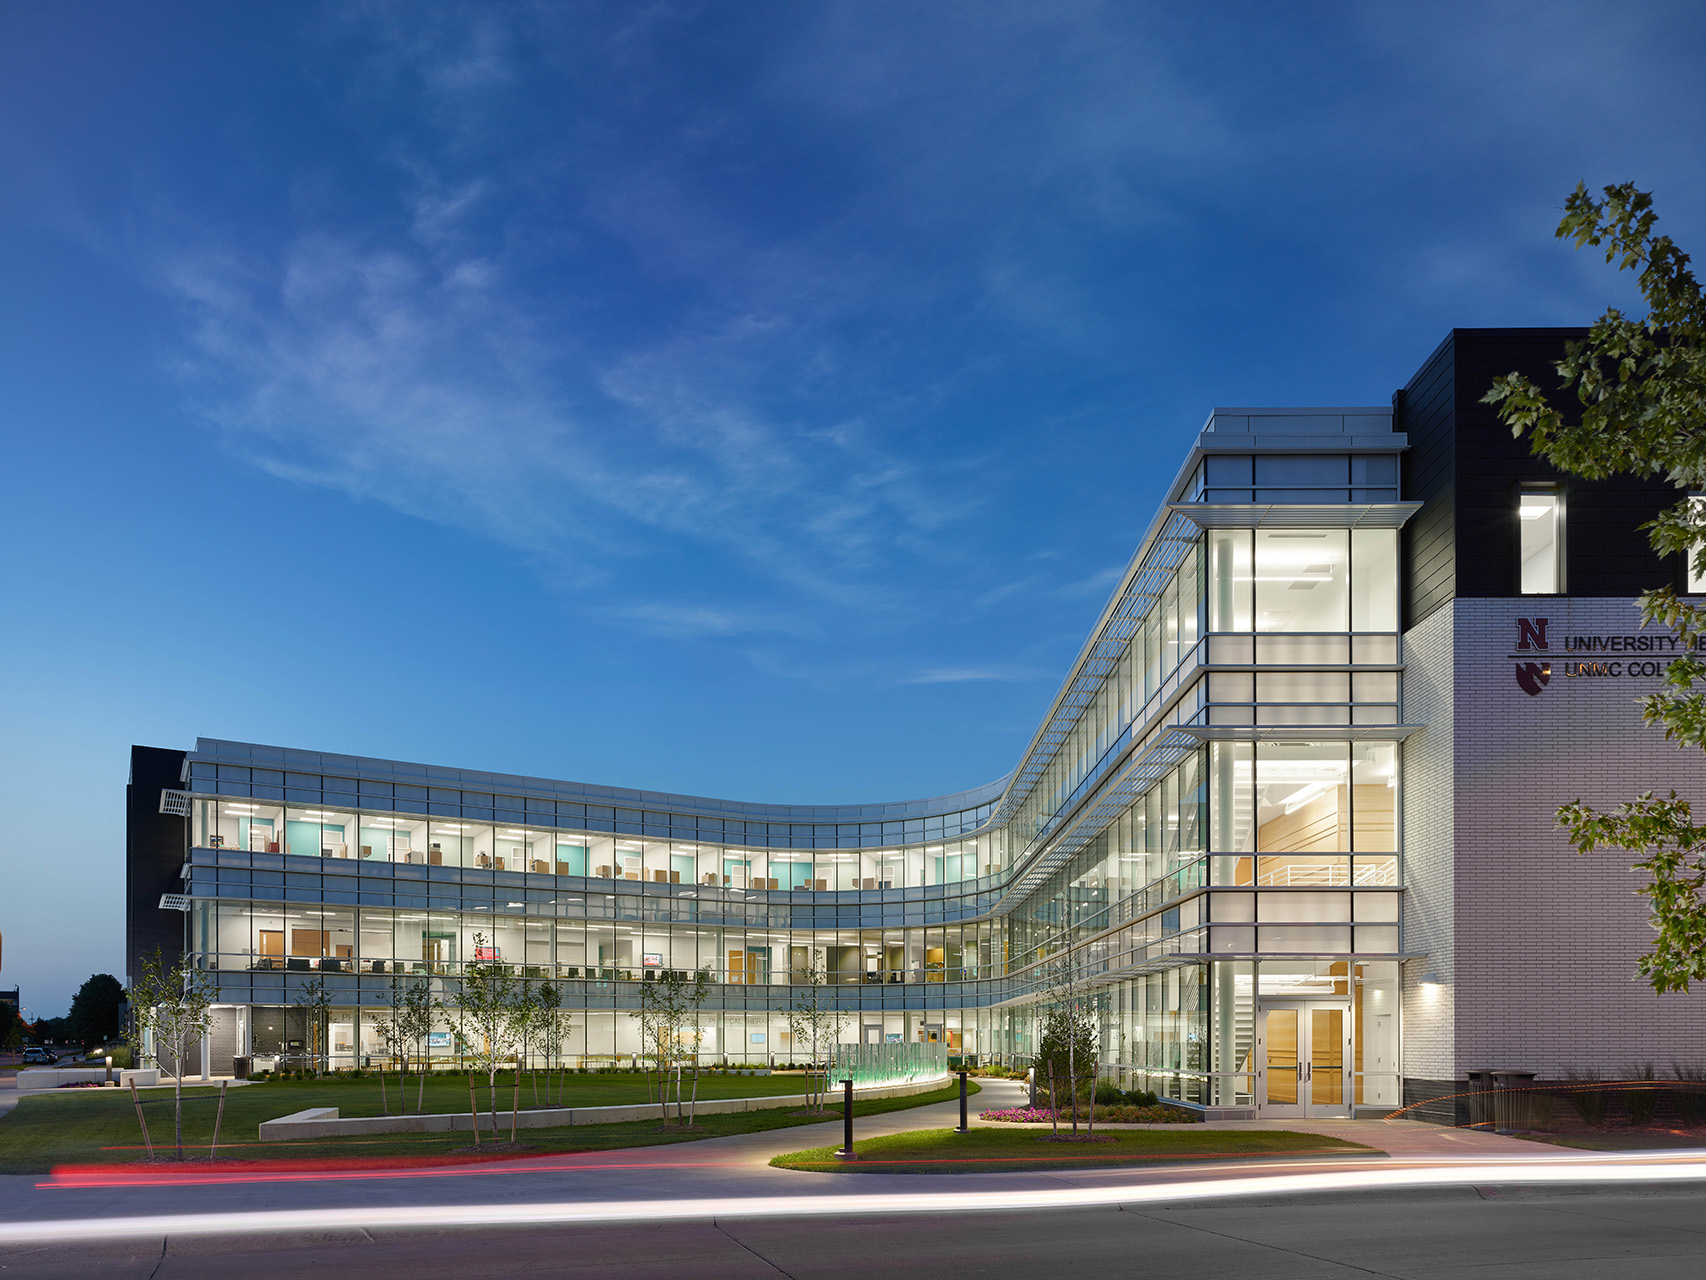 University of Nebraska at Lincoln, Health Center, UNMC College of Nursing    Lincoln, NE            View Gallery »